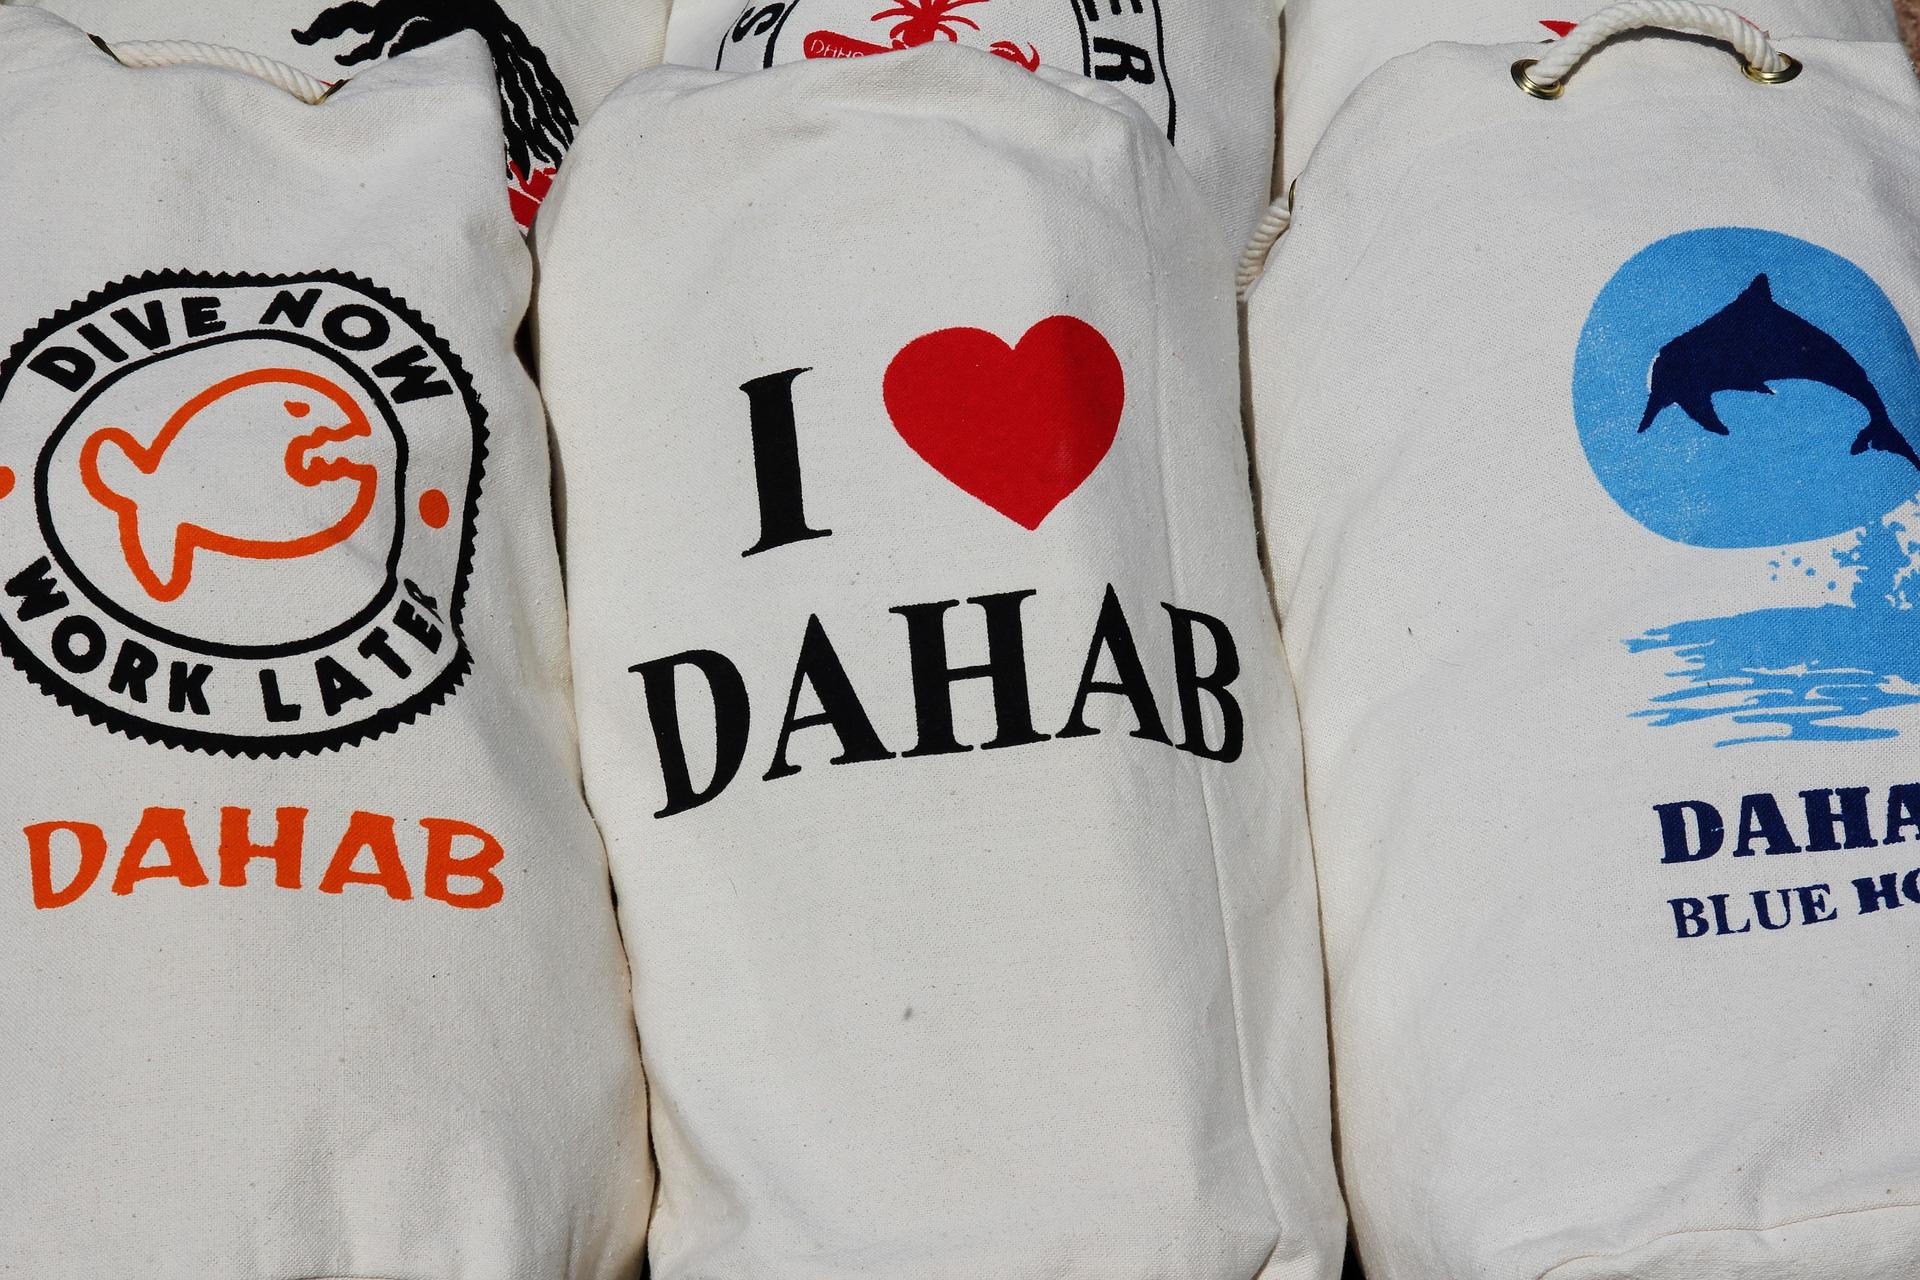 Dahab : The jewel of Sinai